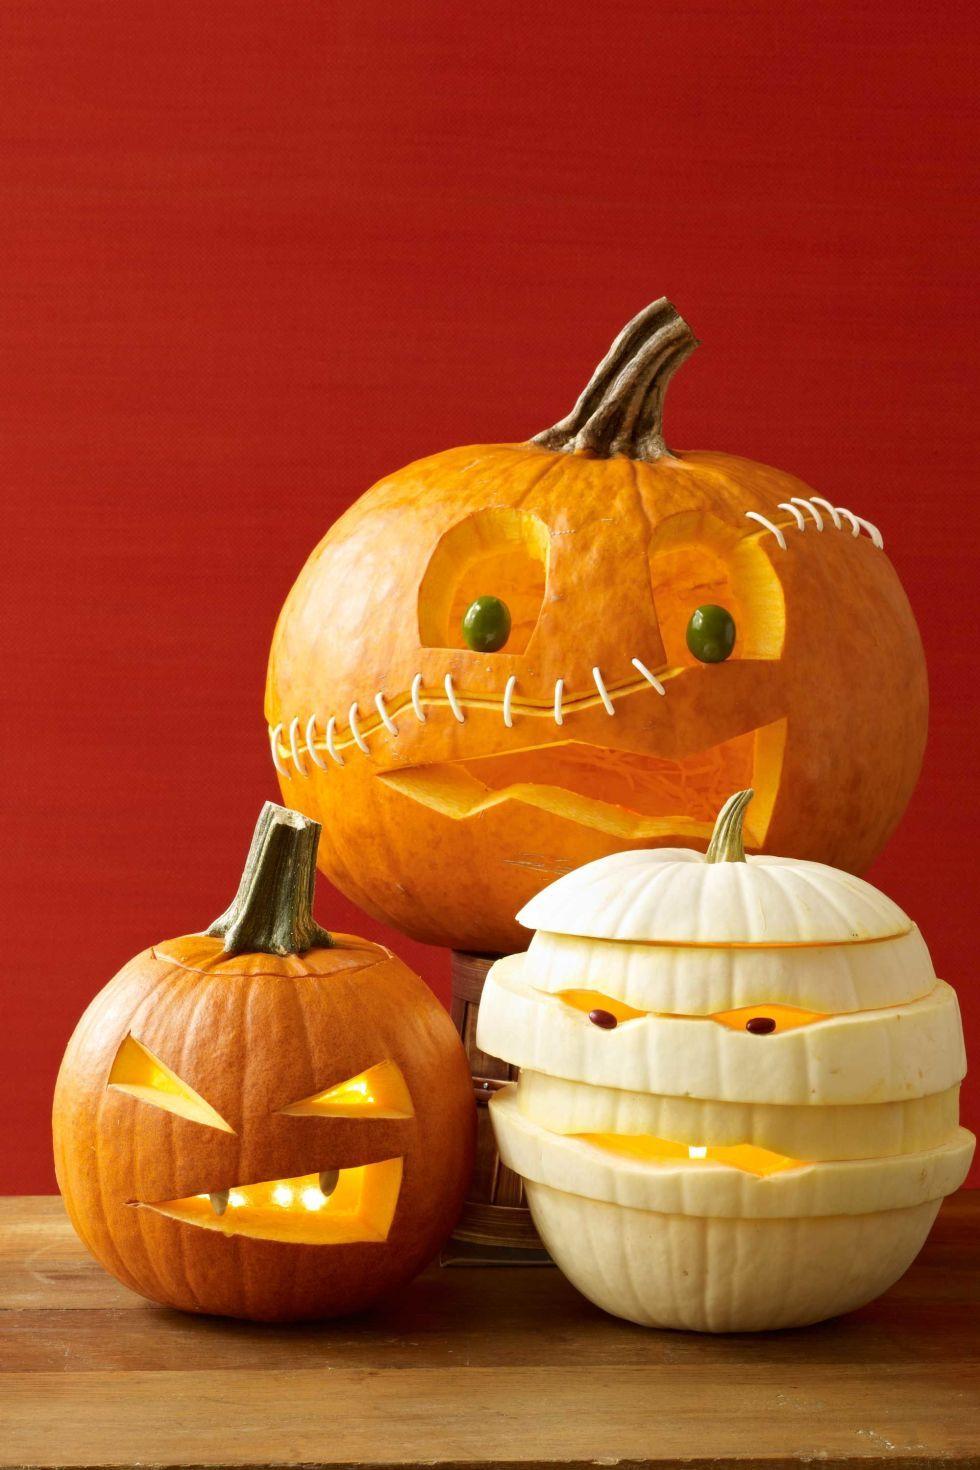 65 of the most creative pumpkin carving ideas - Cool Pumpkin Ideas